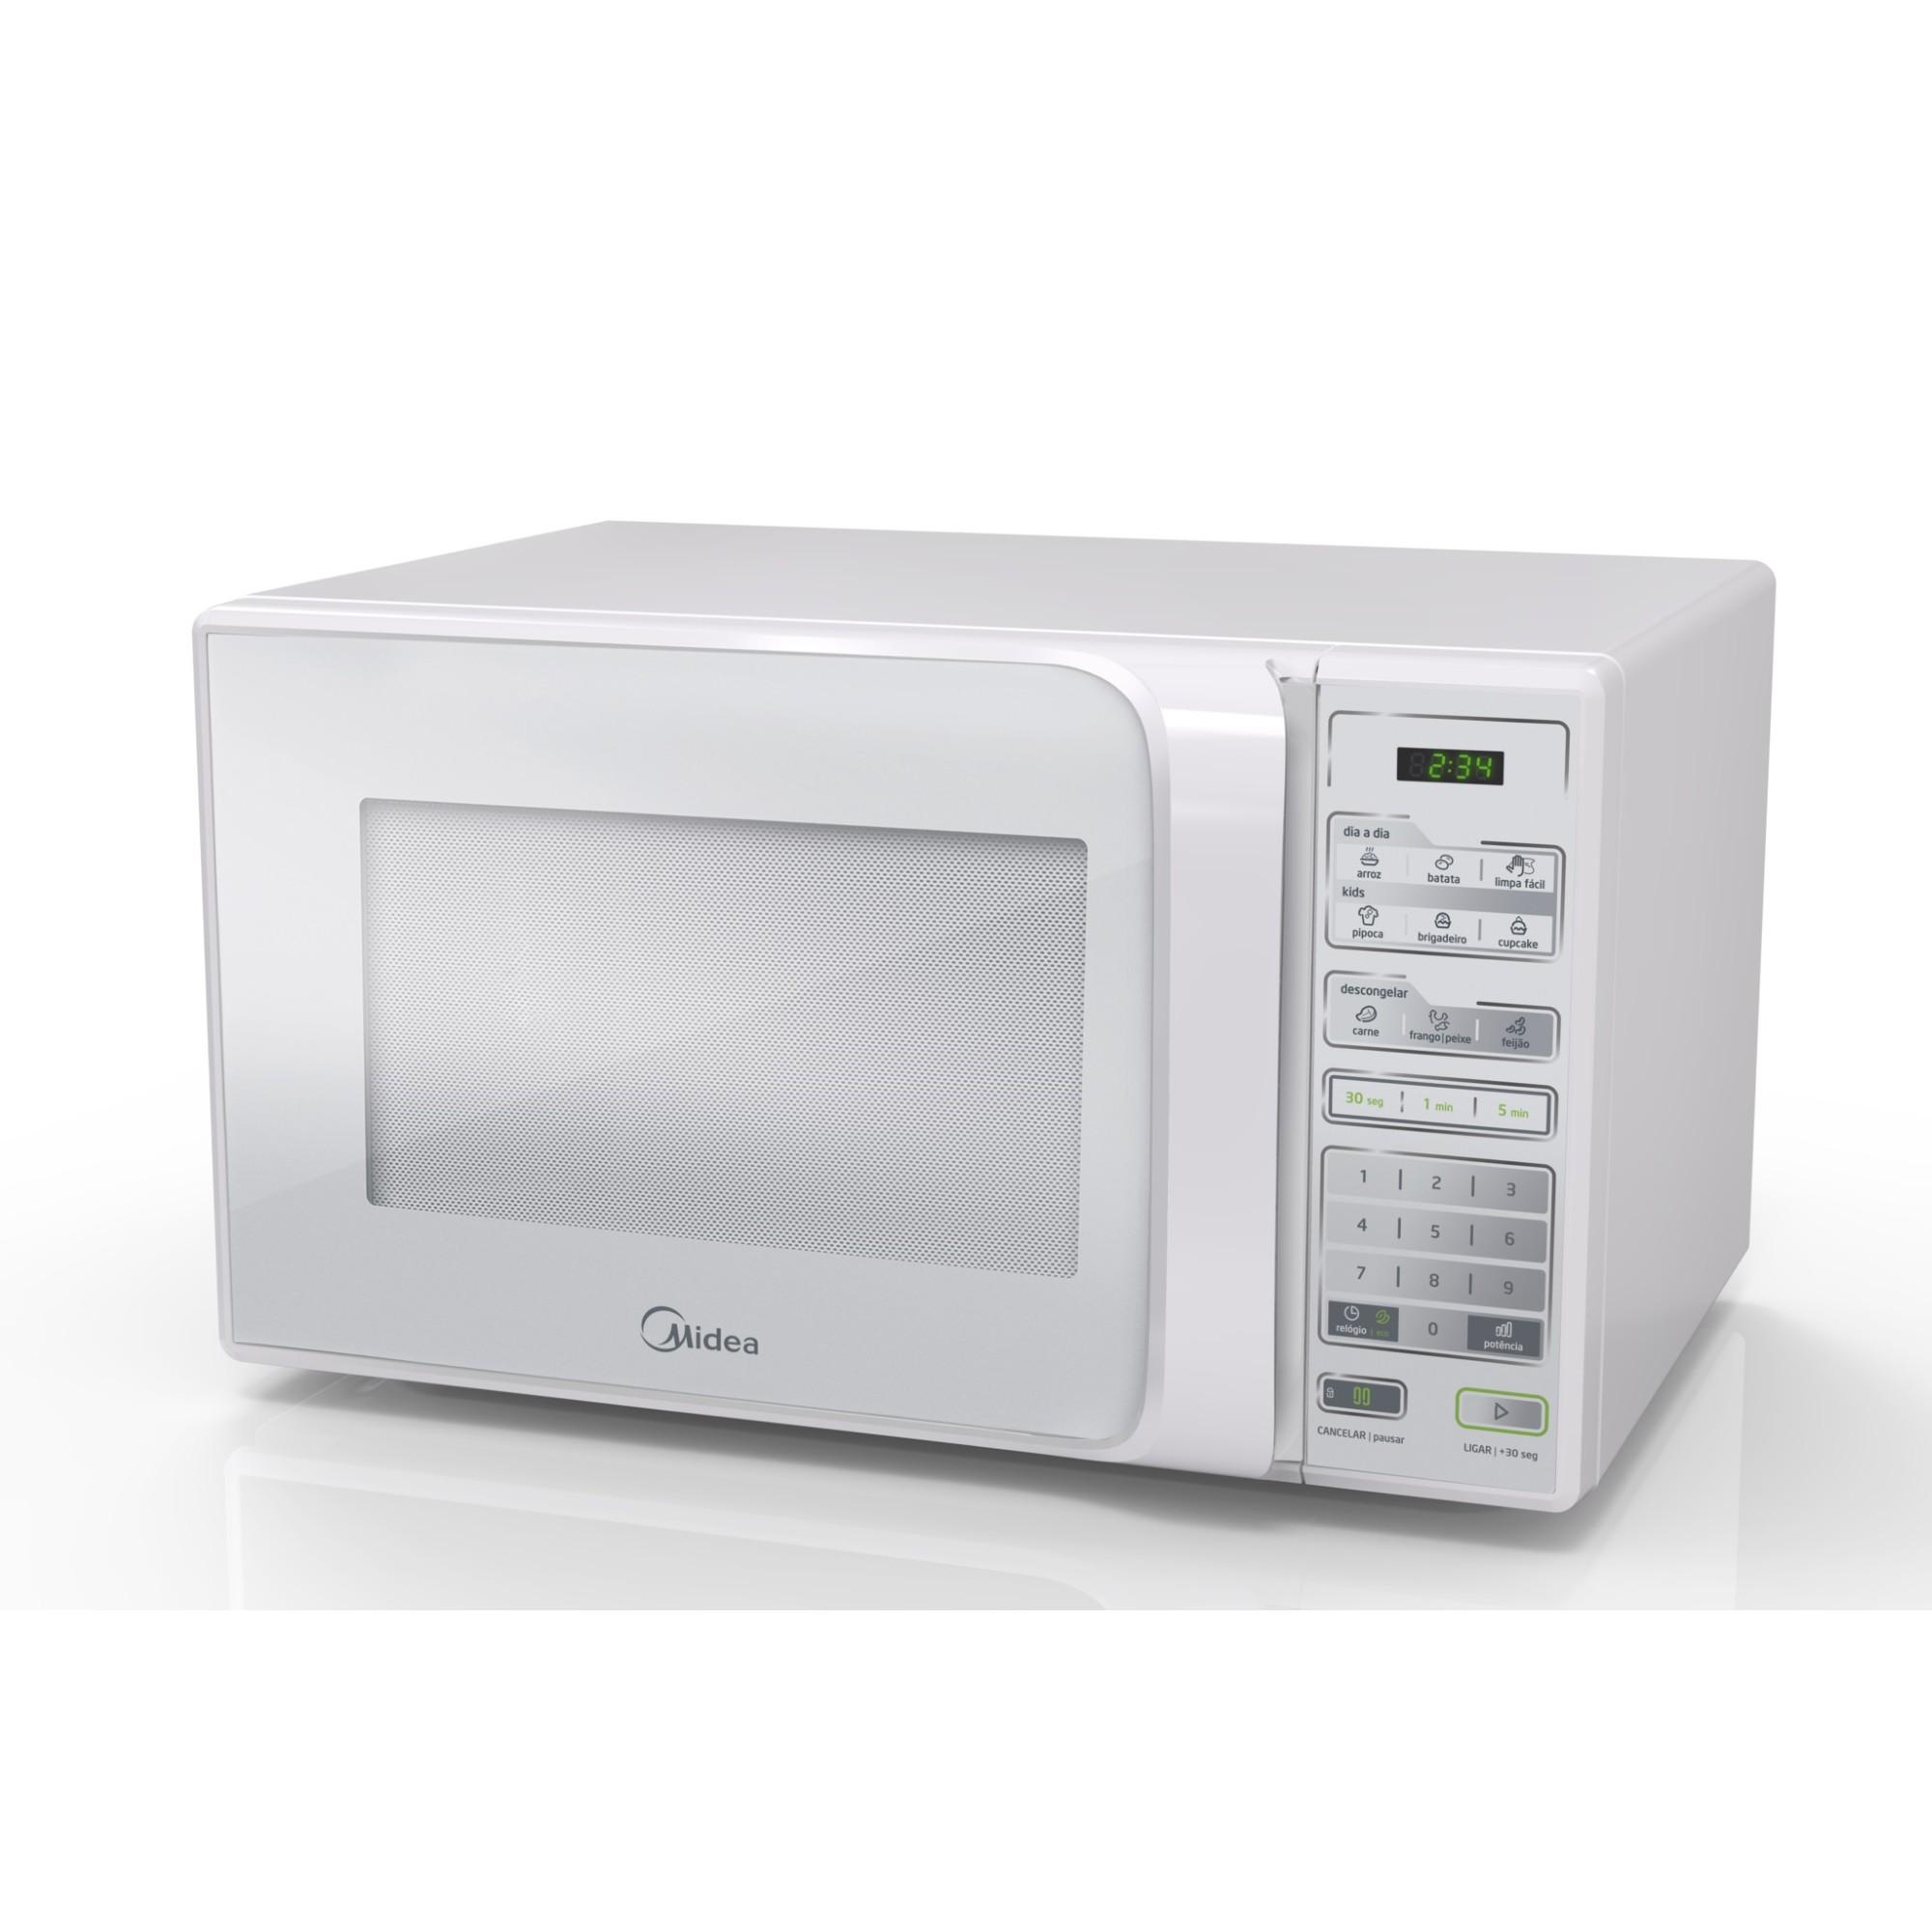 Micro-ondas Midea MTFB22 750w 127V Branco - 20L Painel Touch Timer